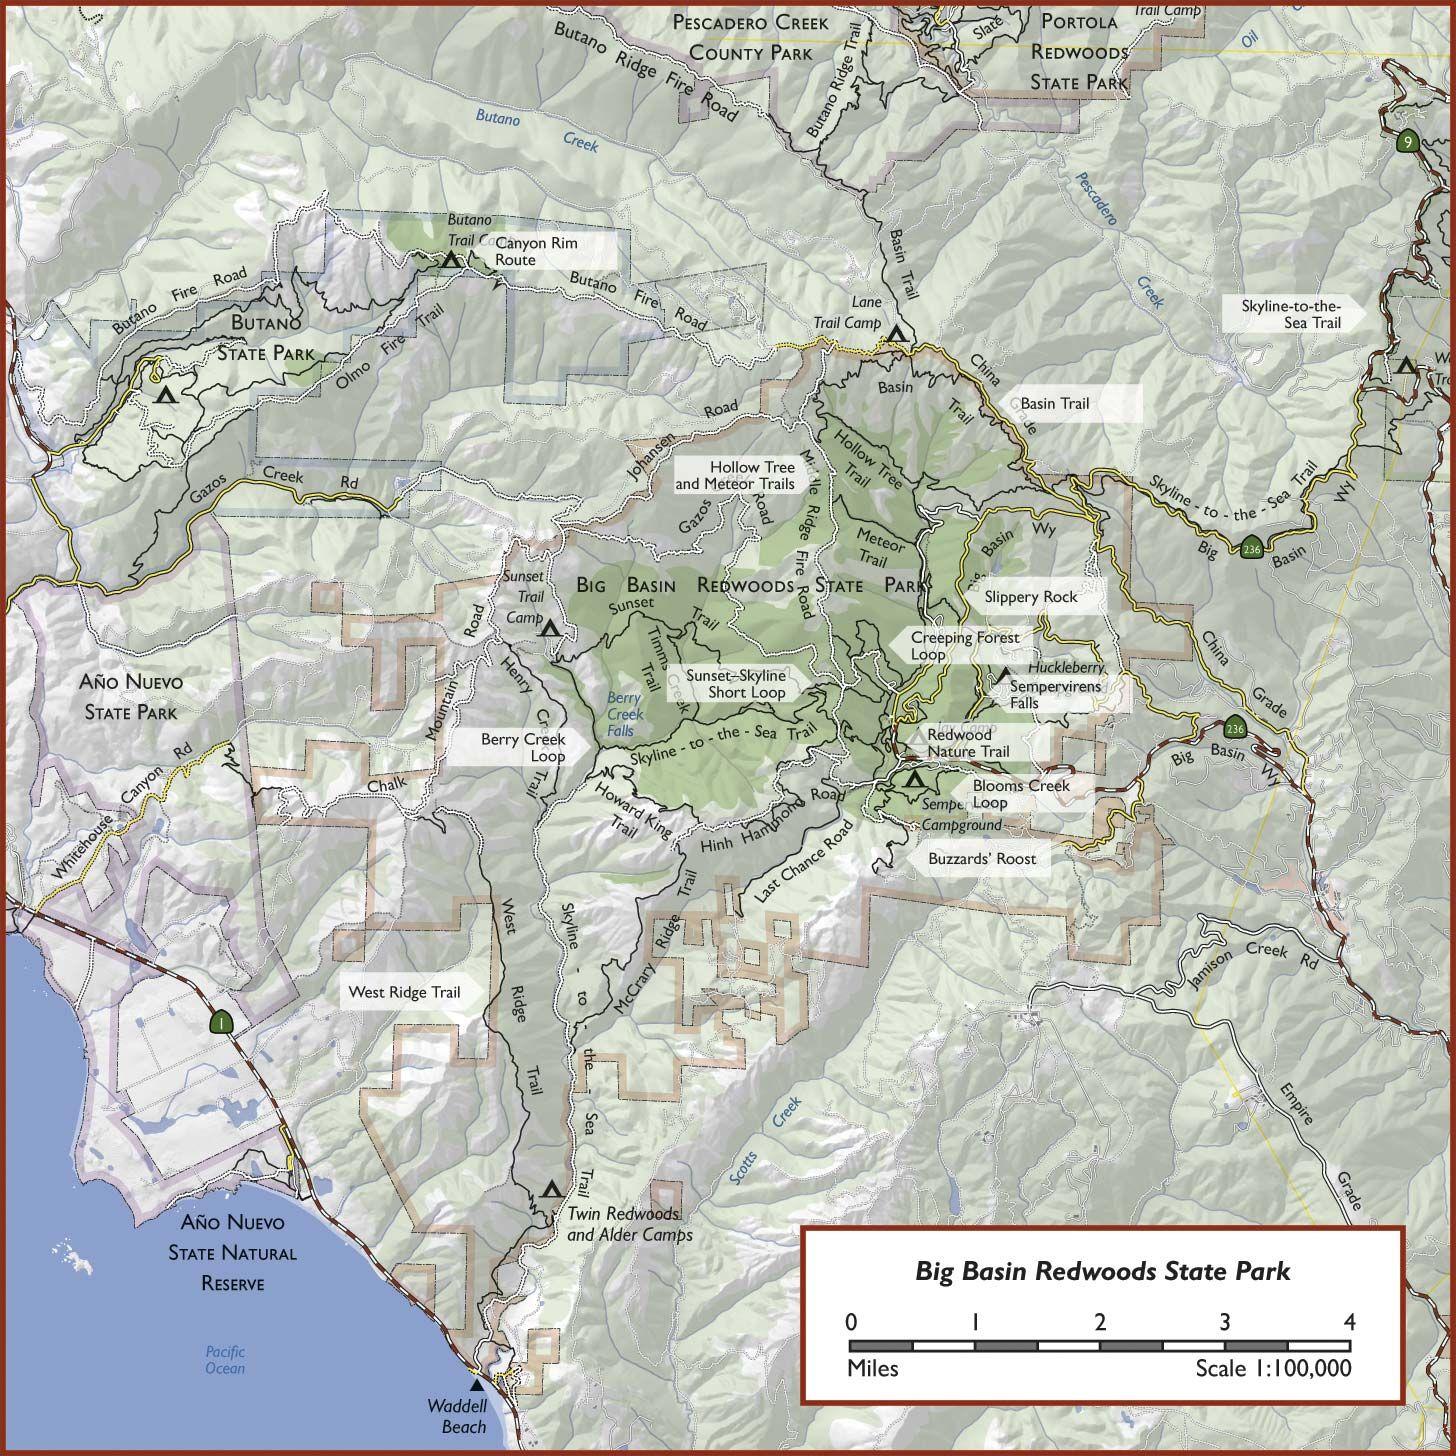 Big Basin Redwoods State Park Hiking Guide | Rice-A-Roni | Big basin ...